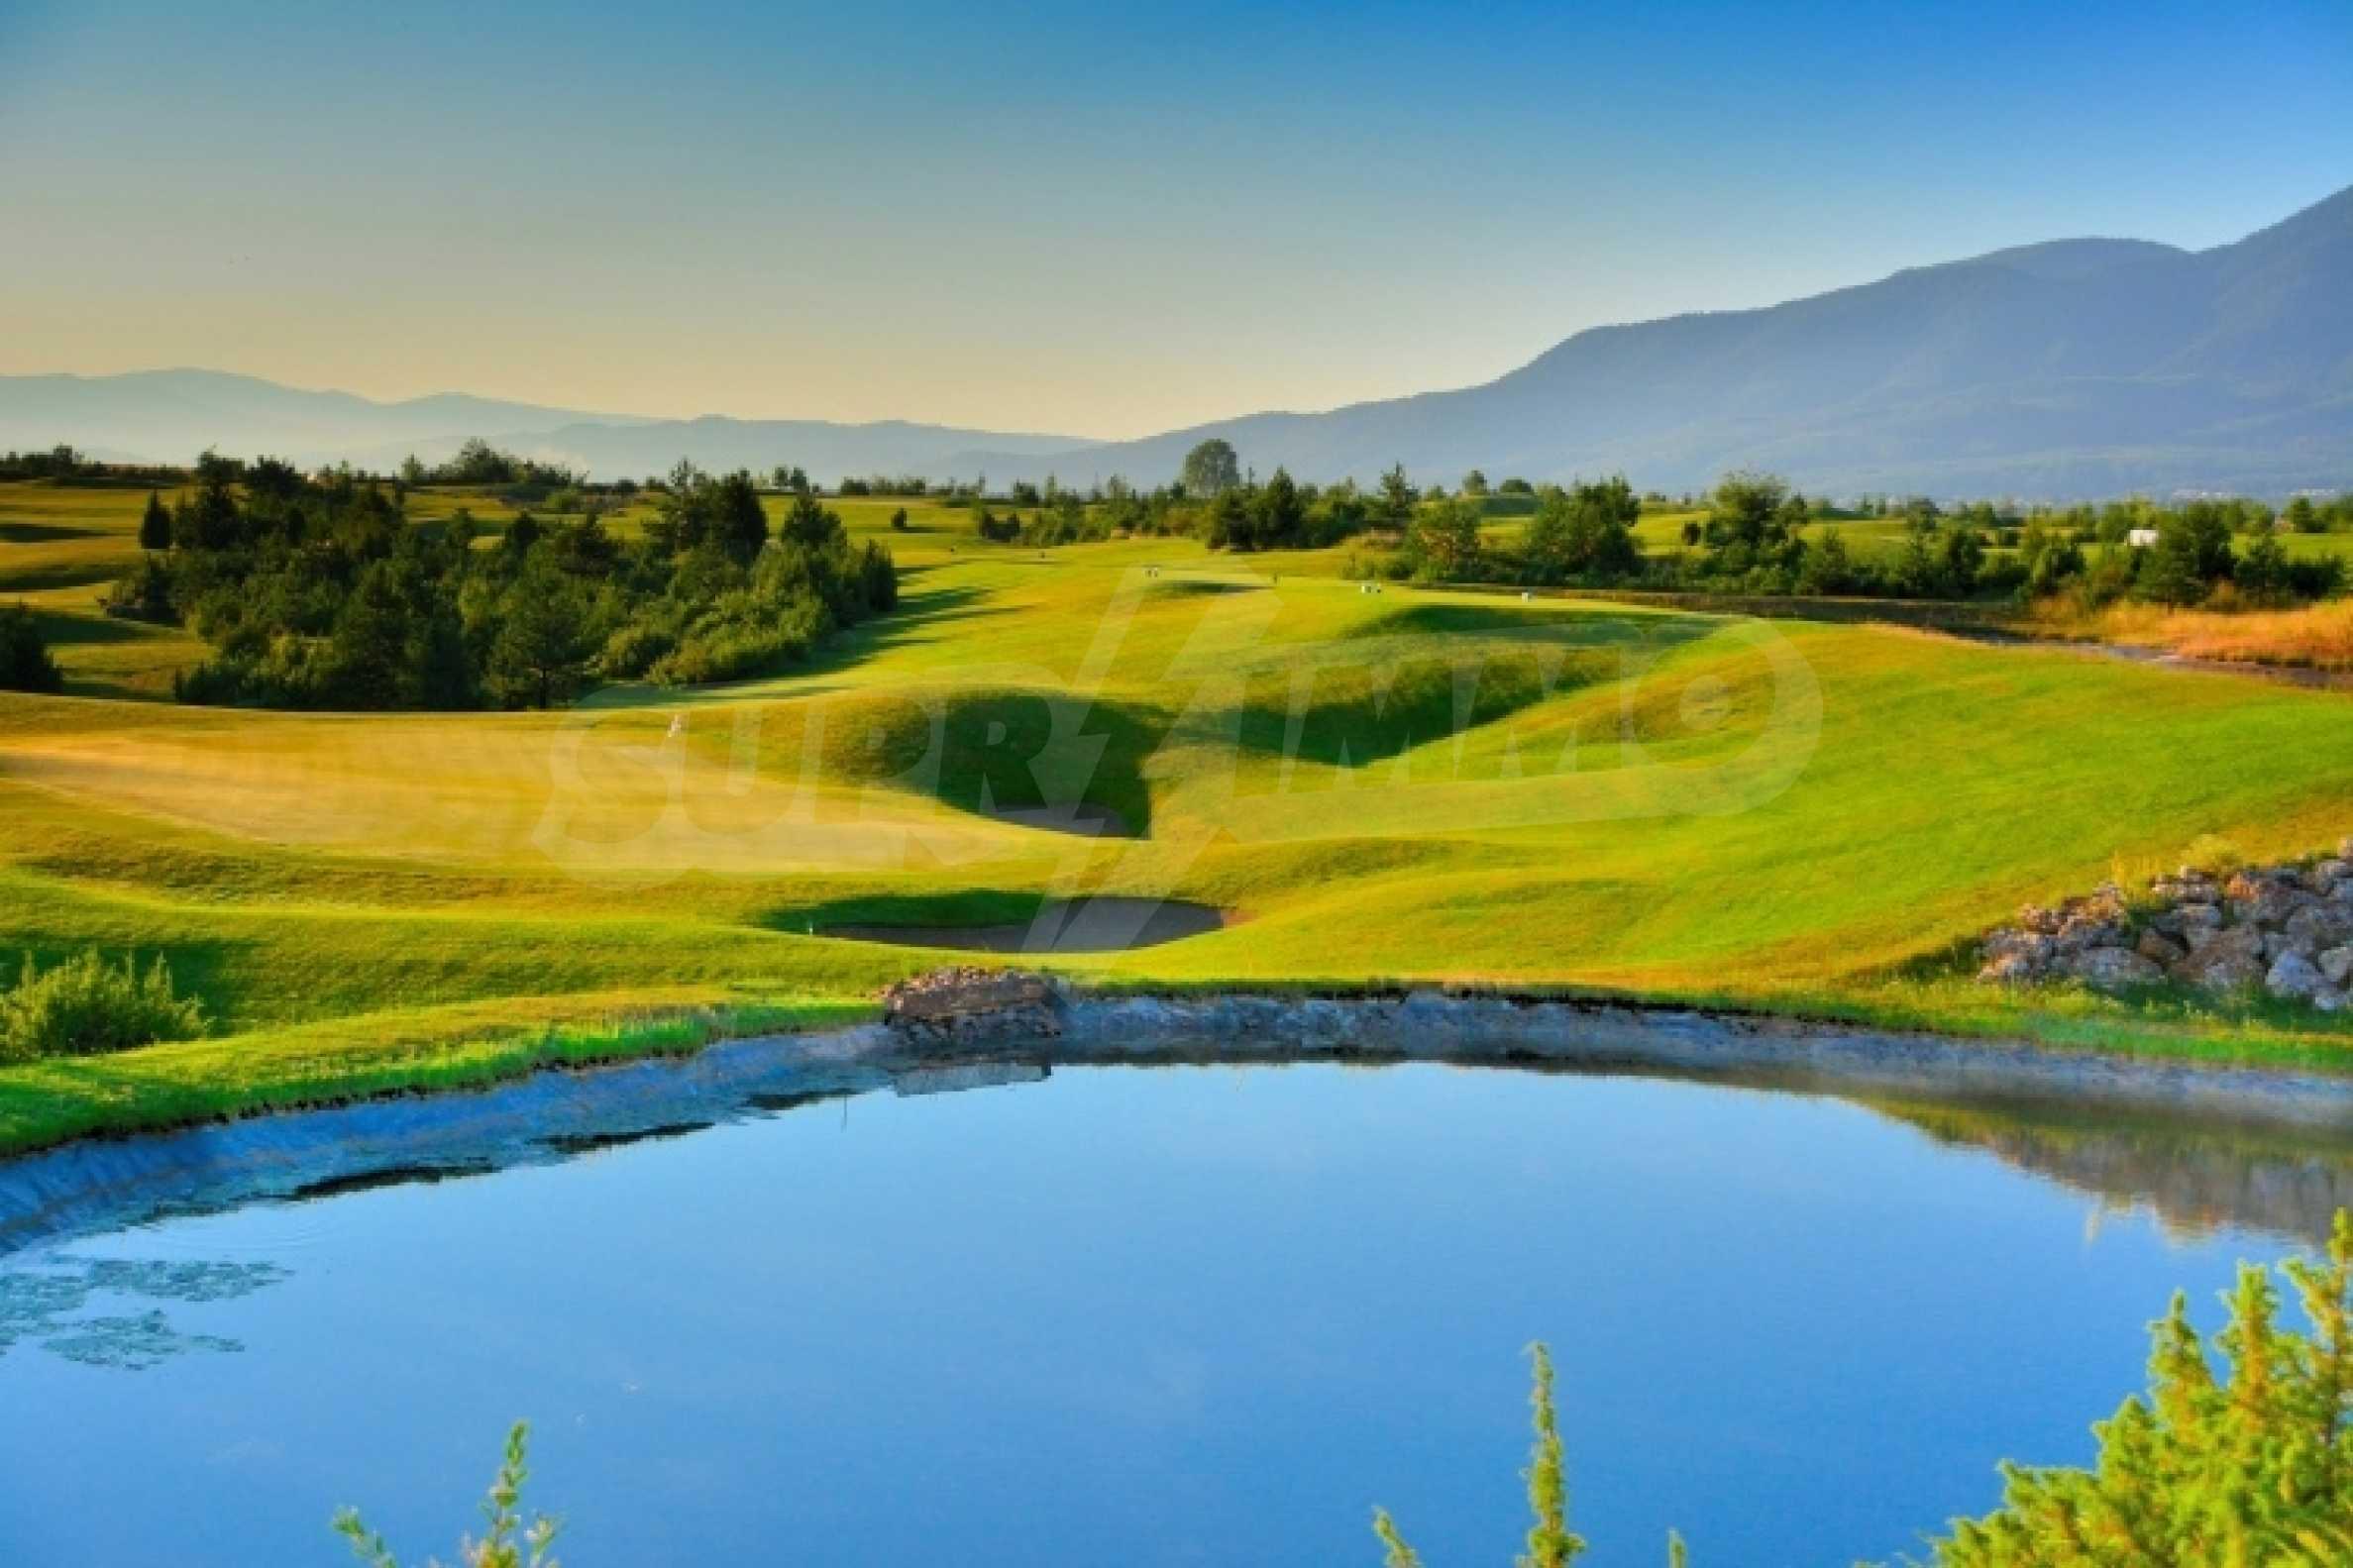 Широк избор от апартаменти в голф комплекс, гр. Разлог 44